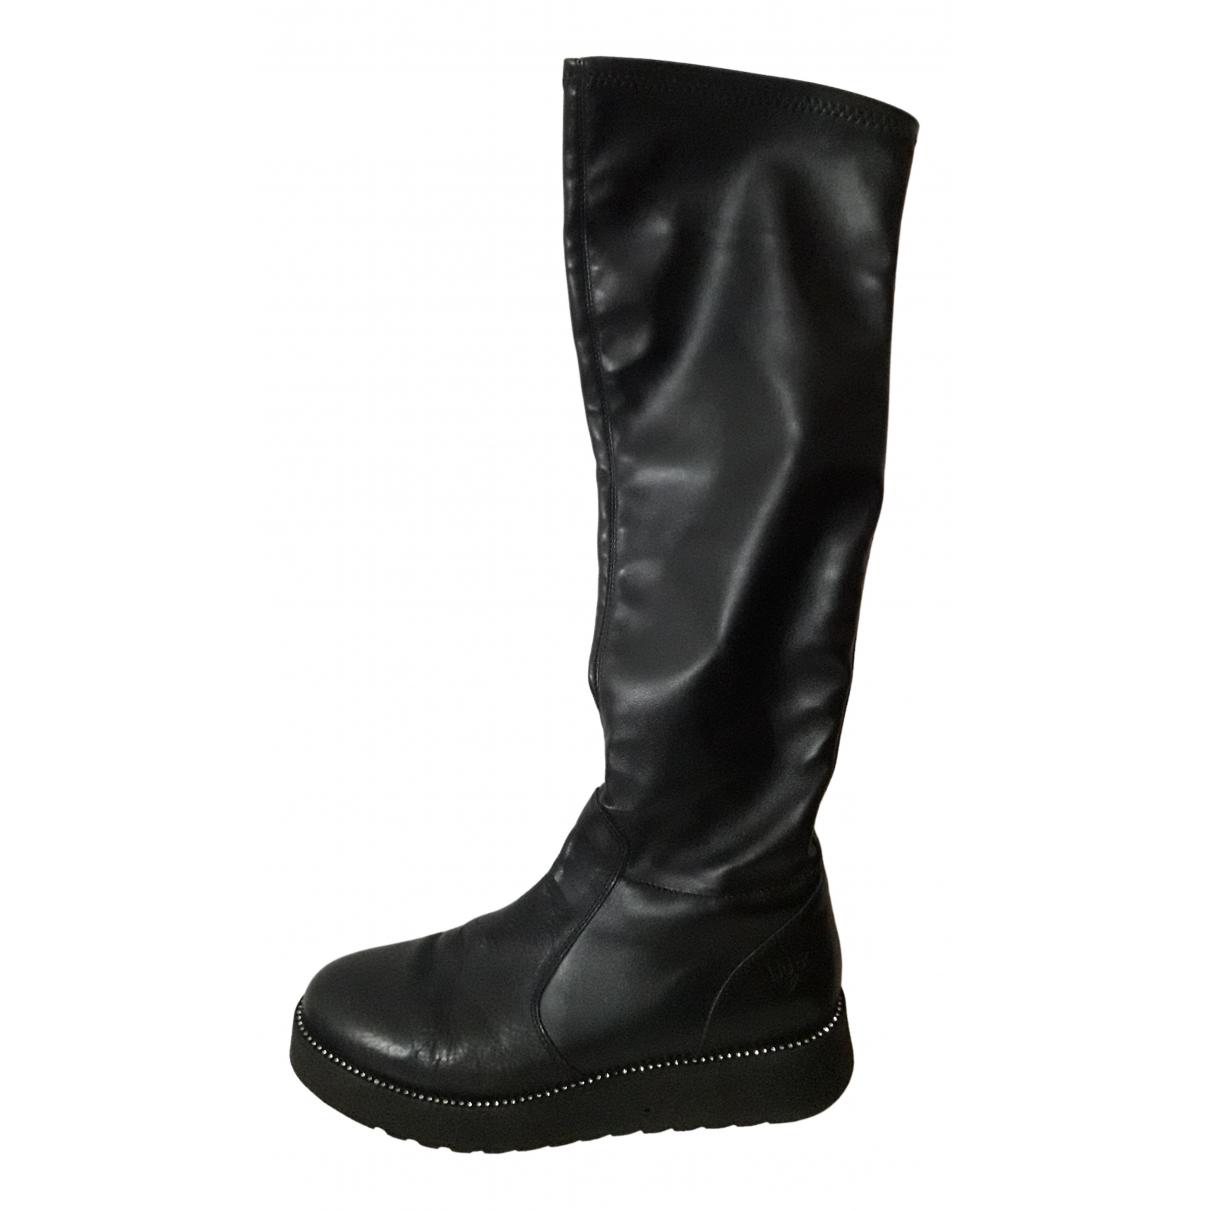 Liu.jo N Black Leather Boots for Women 39 EU